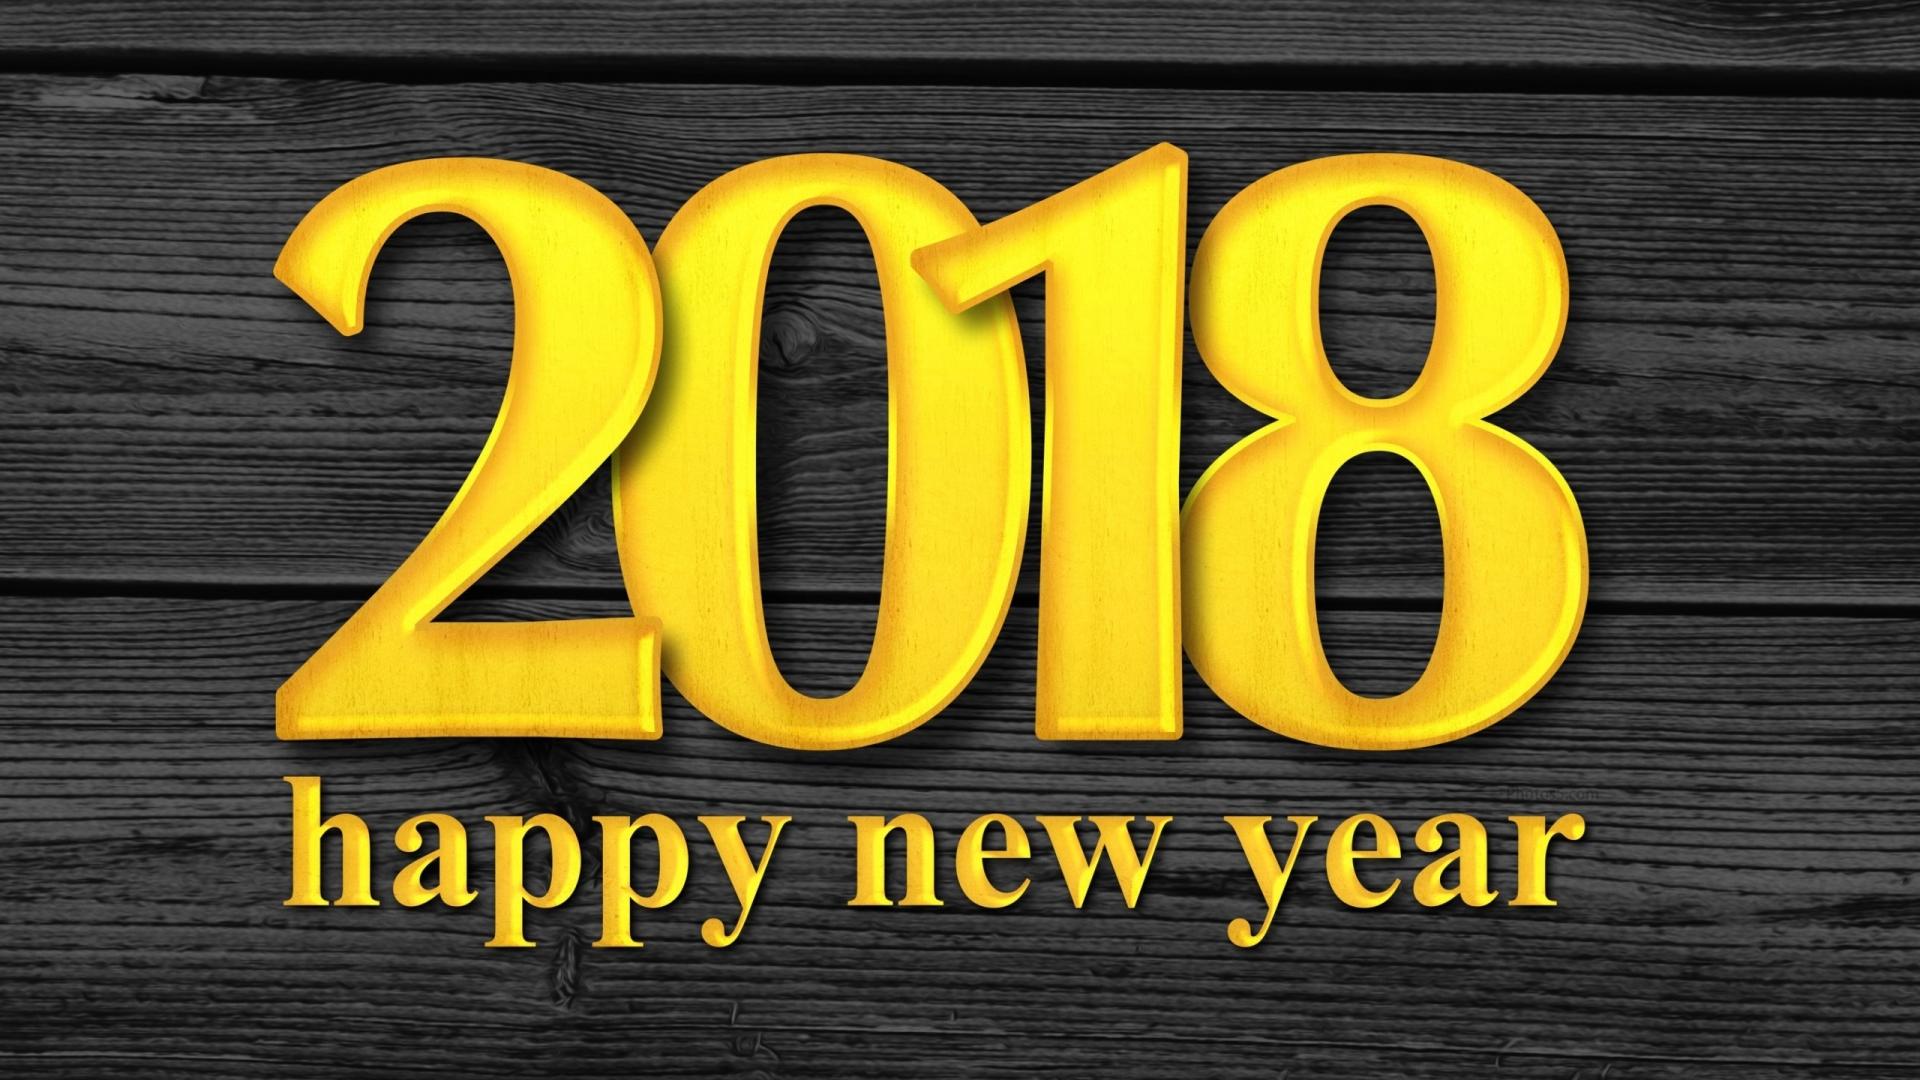 1920x1080 New Year 2018 Happy New Year 1080P Laptop Full HD